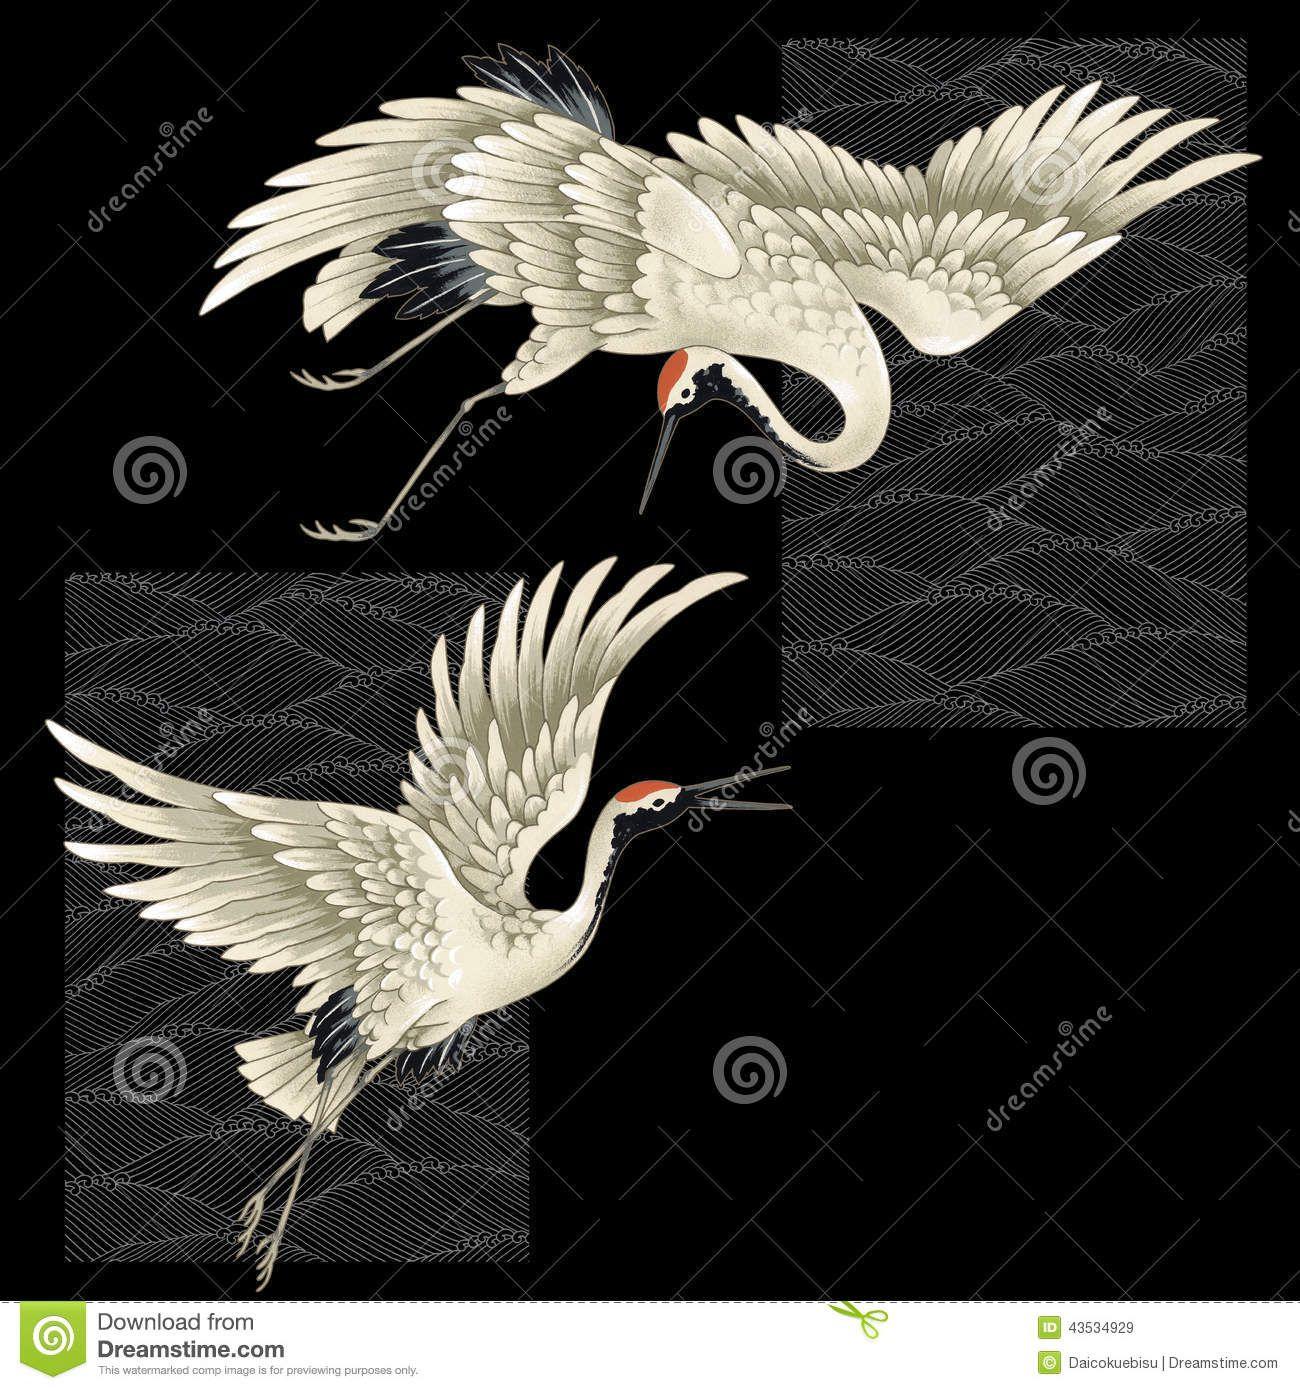 japanese crane pencil drawing - Google Search | tattoos ... - photo#9